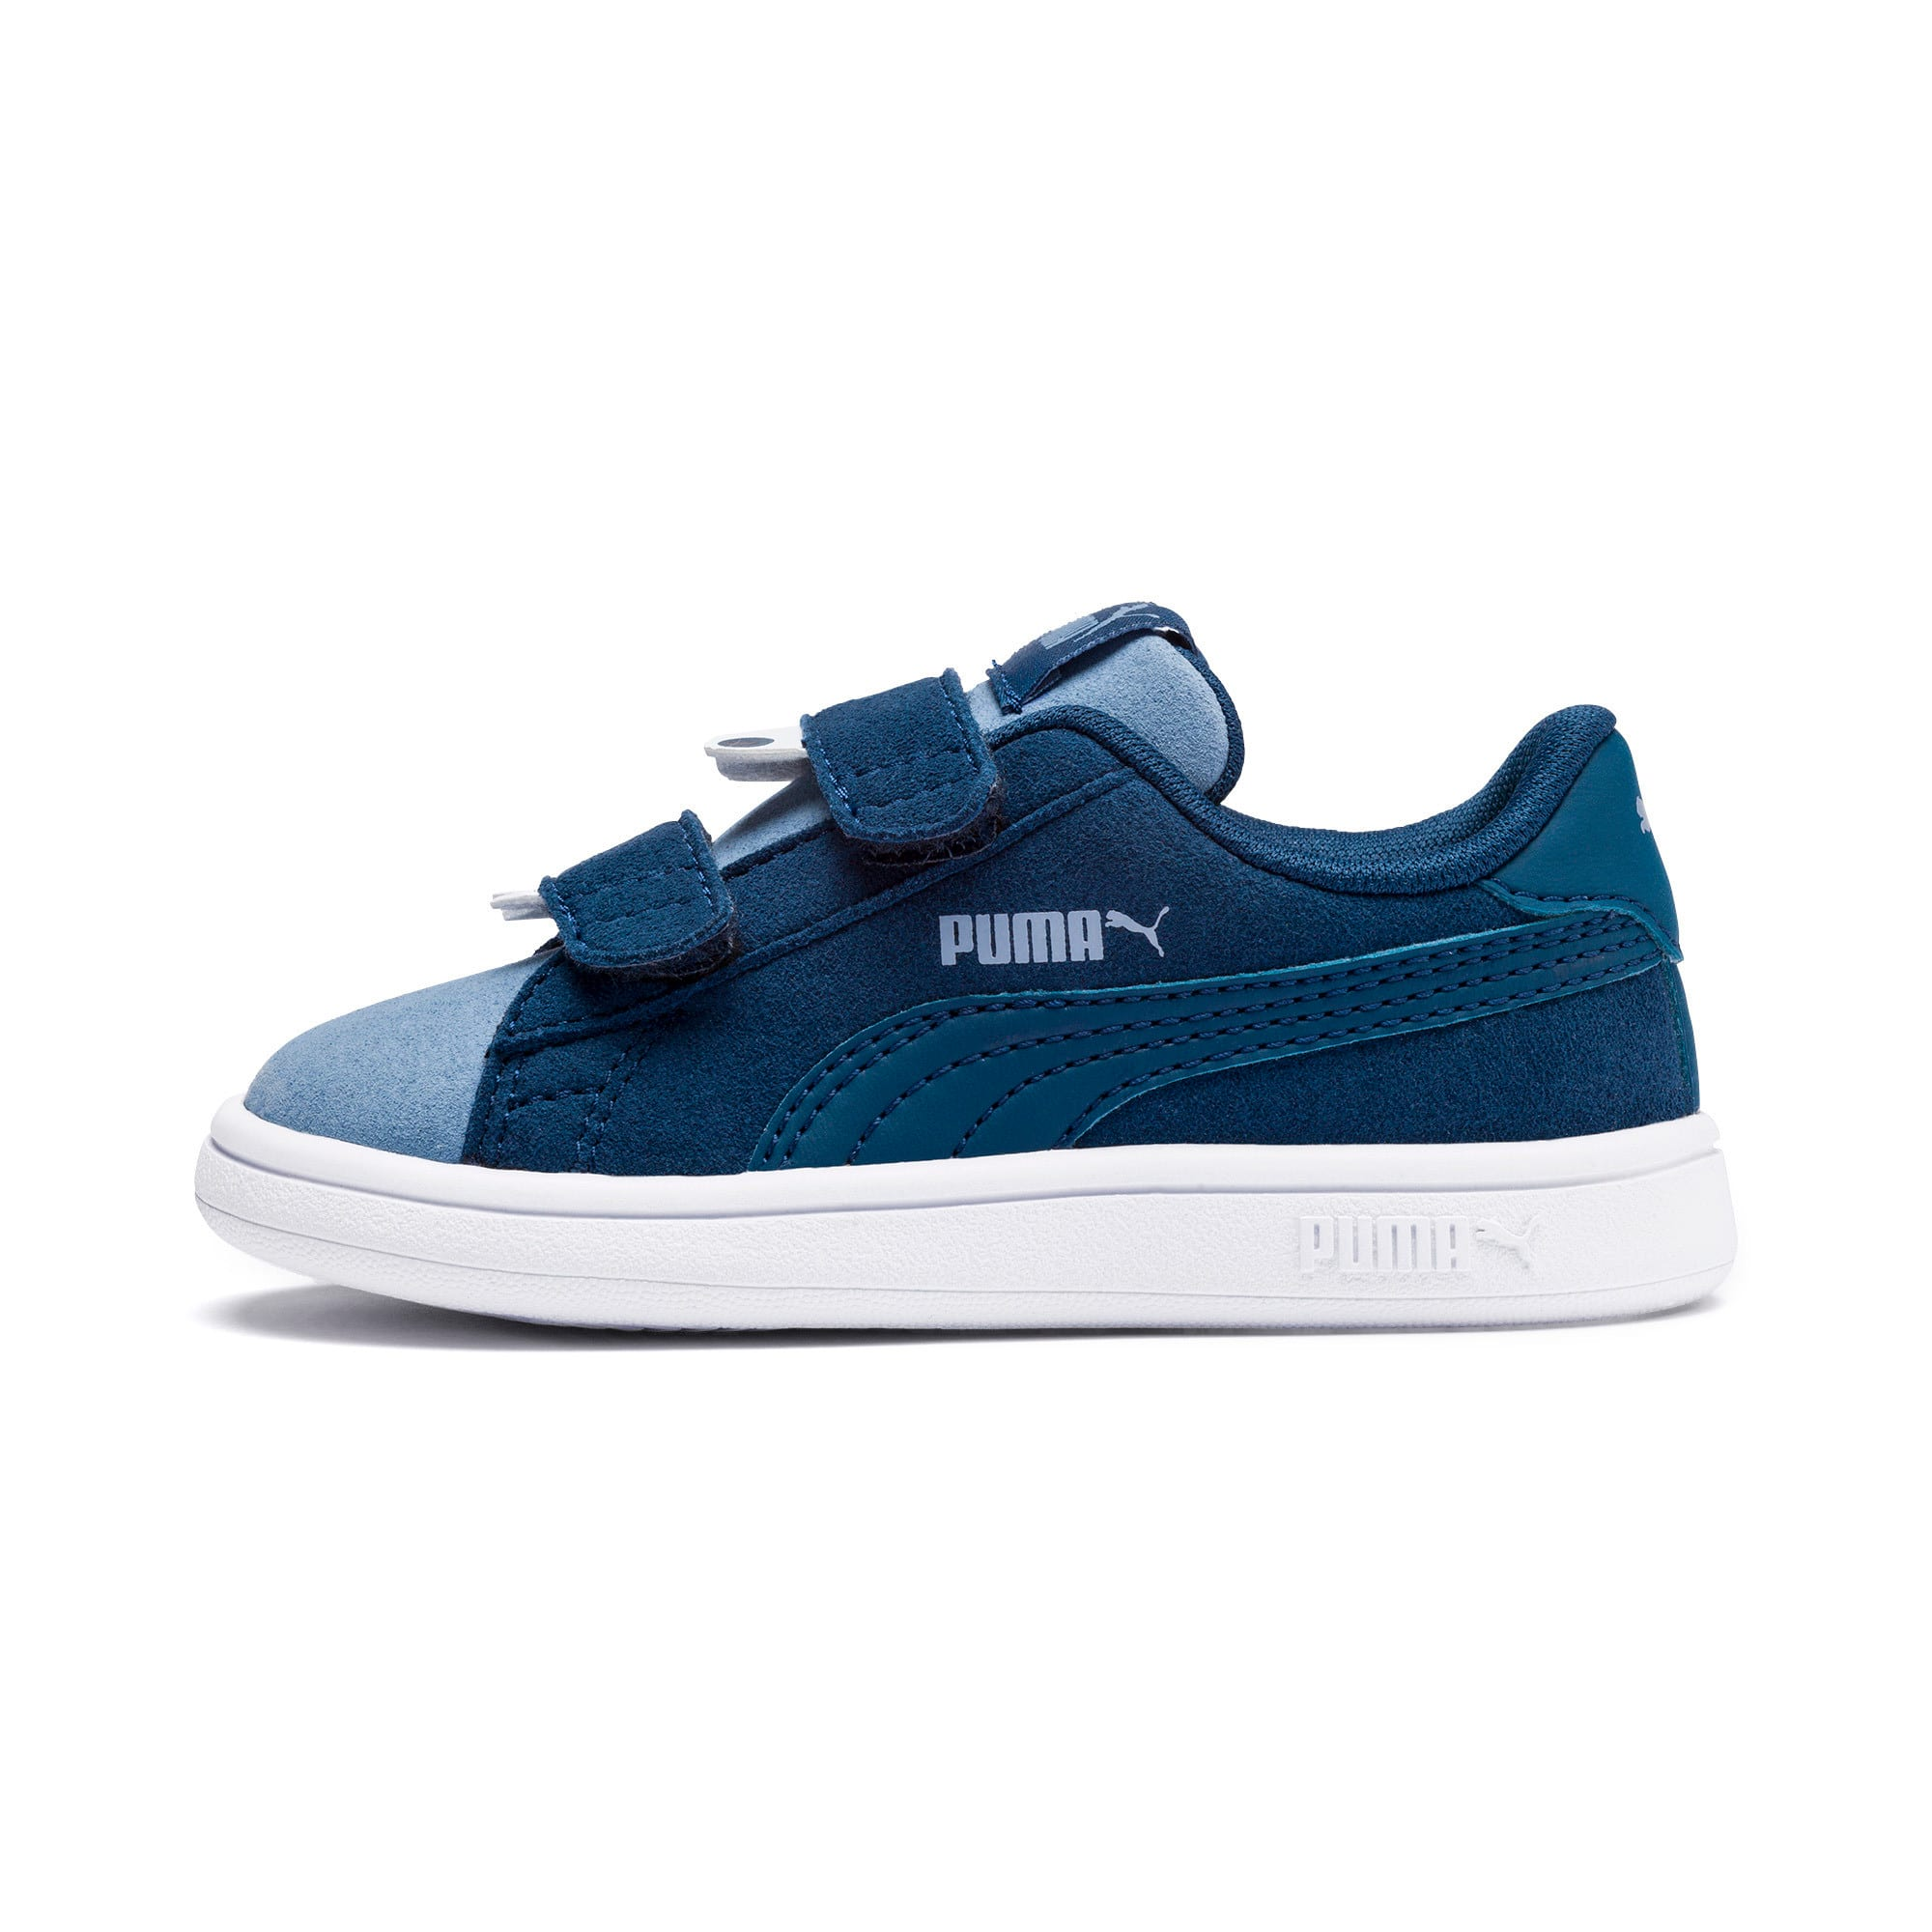 Thumbnail 1 of PUMA Smash v2 Monster Toddler Shoes, Gibraltar Sea-Faded Denim, medium